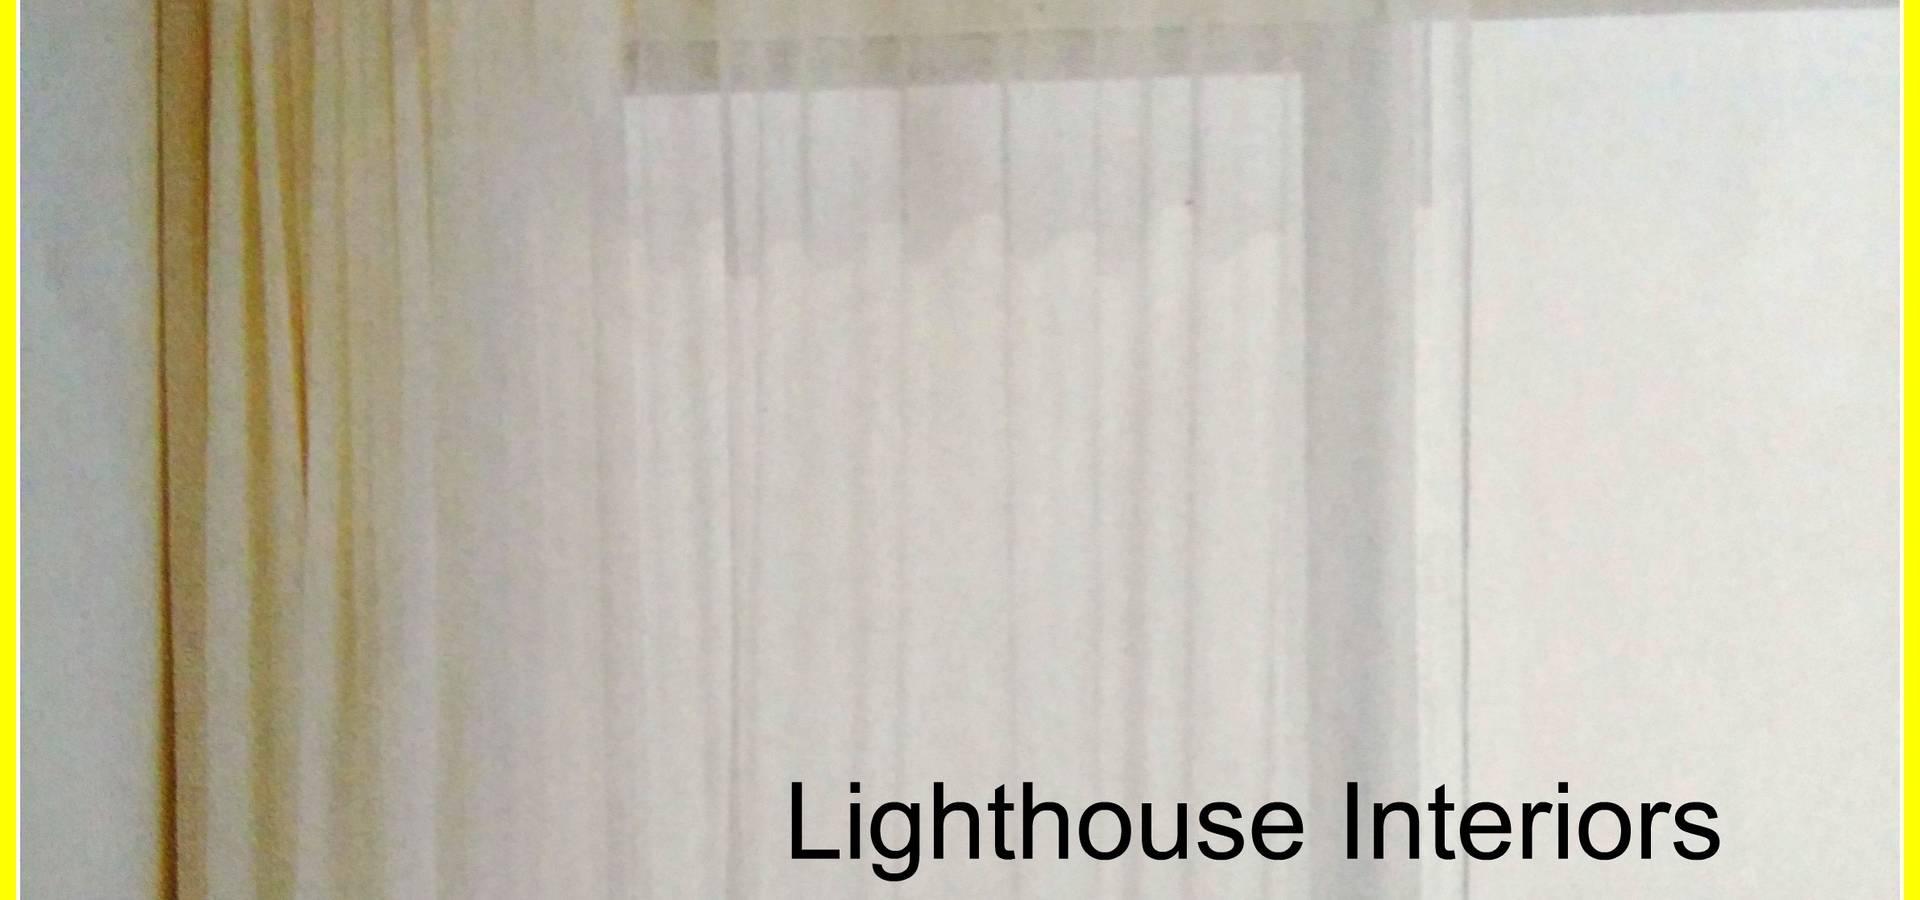 Lighthouse Interiors